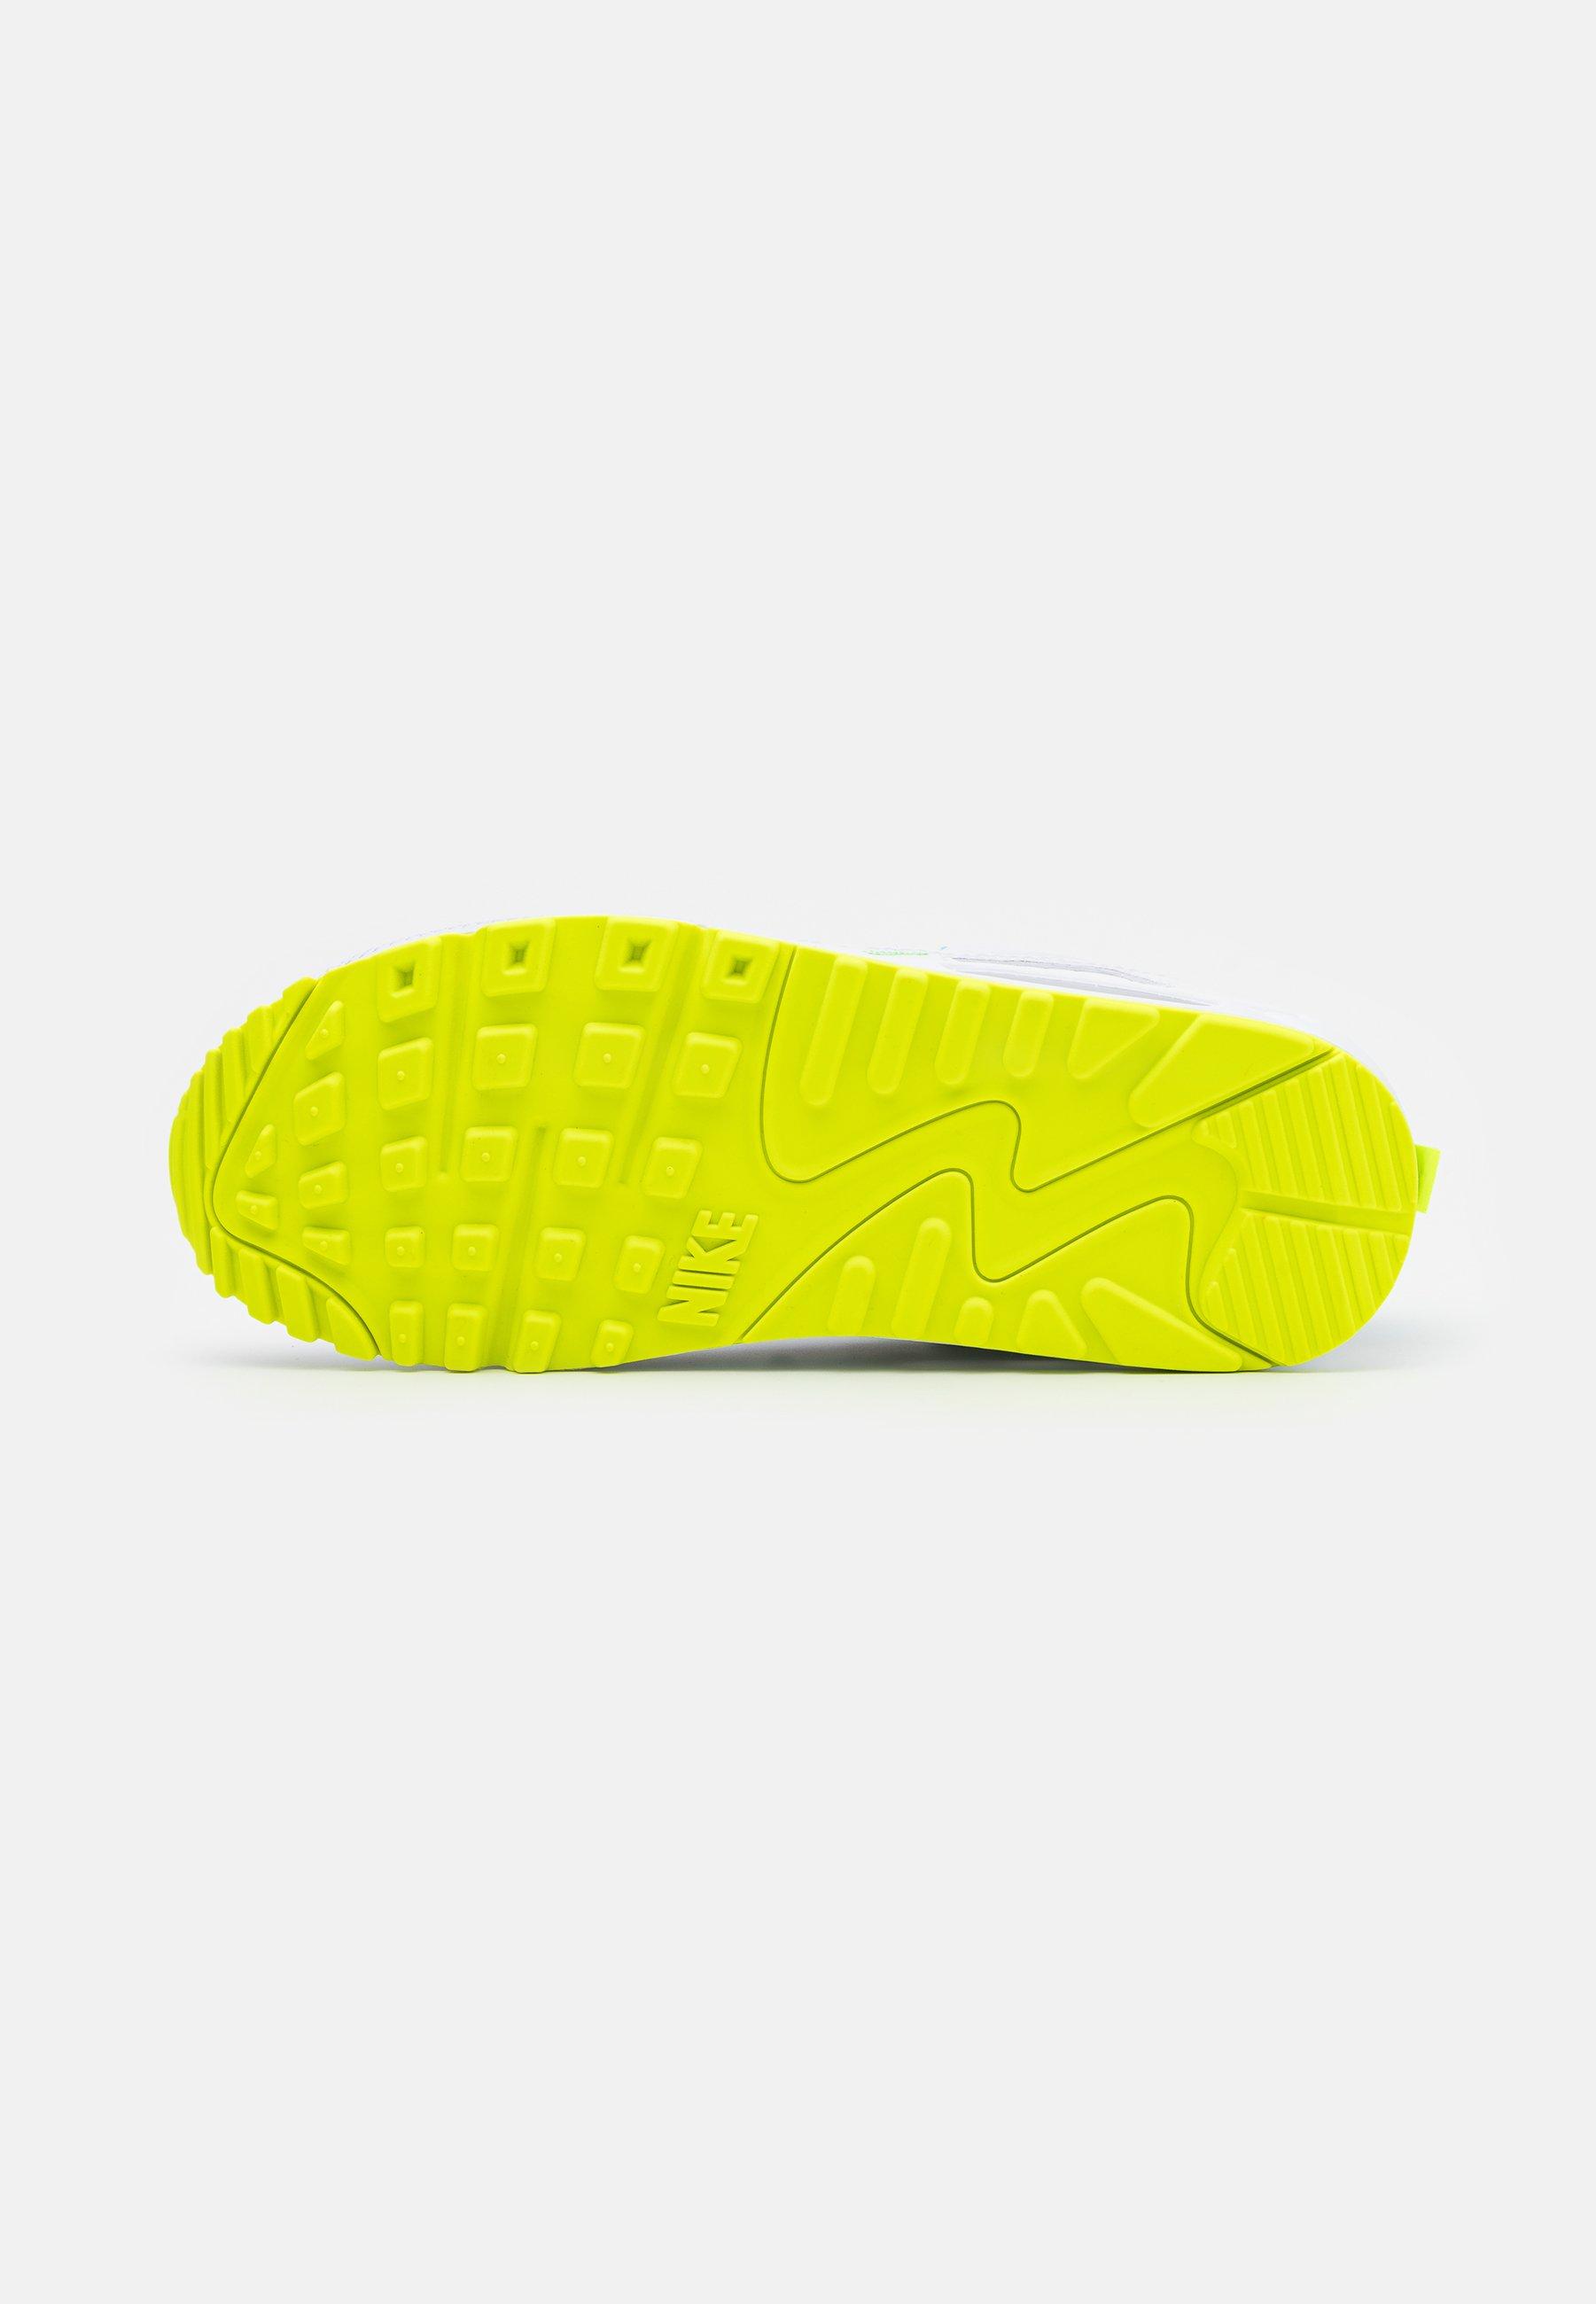 Nike Sportswear AIR MAX 90 Joggesko sailblackghost